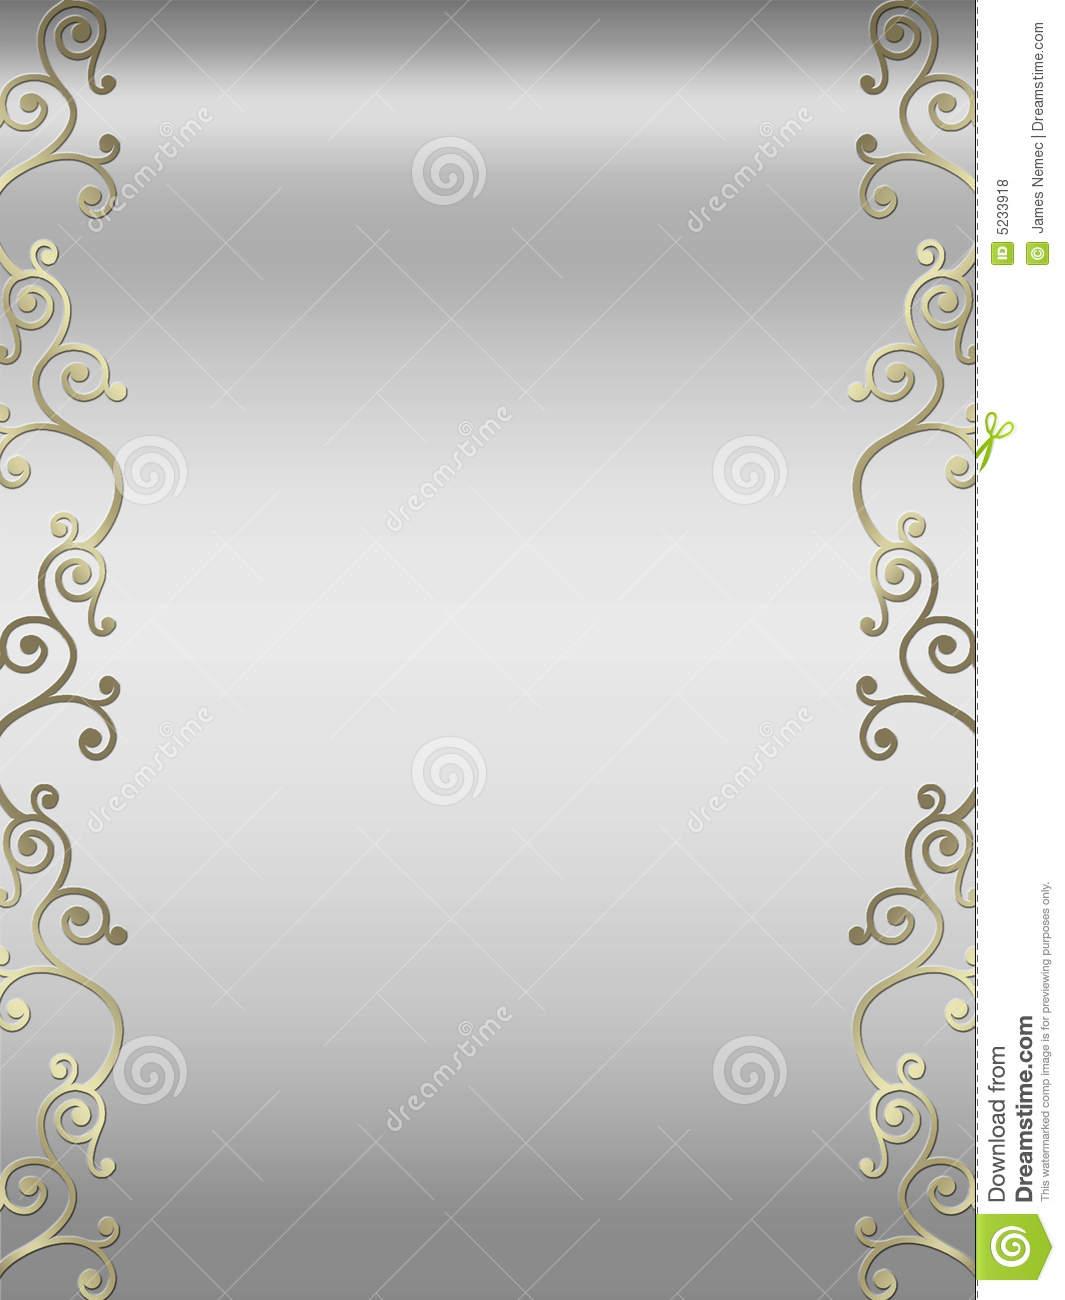 17 elegant border designs images elegant page borders